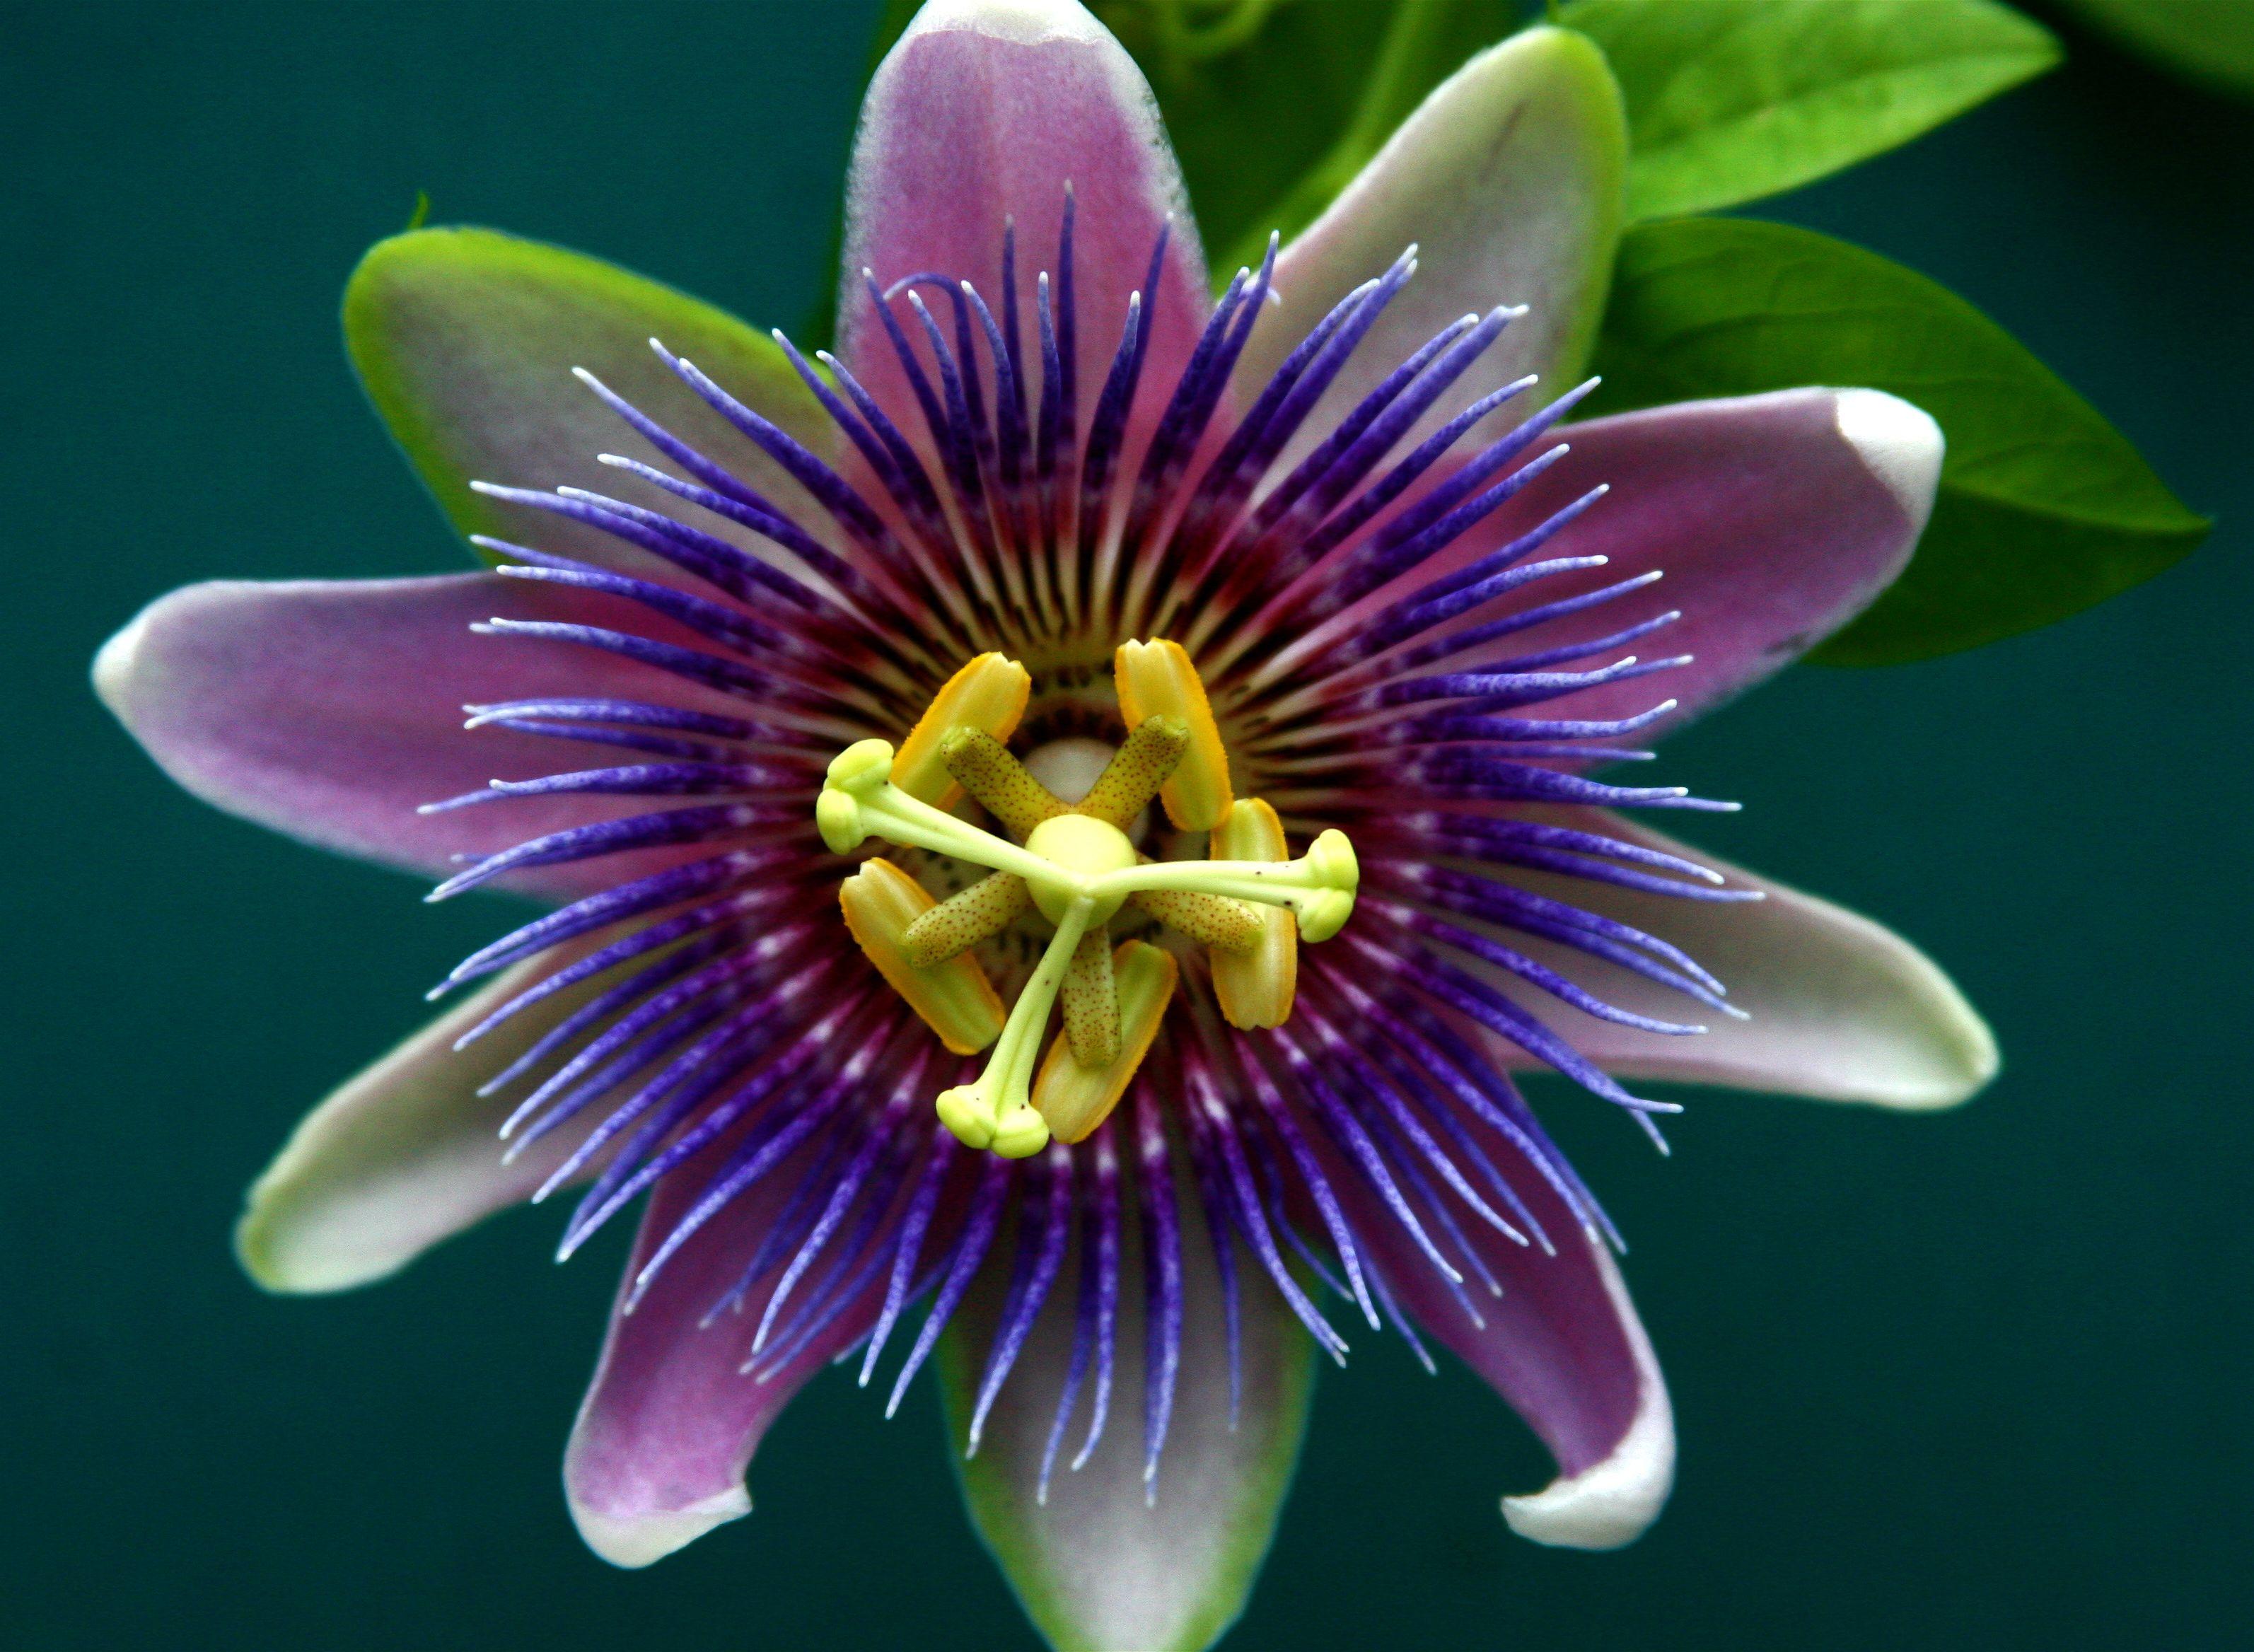 Scent Sensibility The Passion Flower Passion Flower Passion Fruit Flower Purple Passion Flower